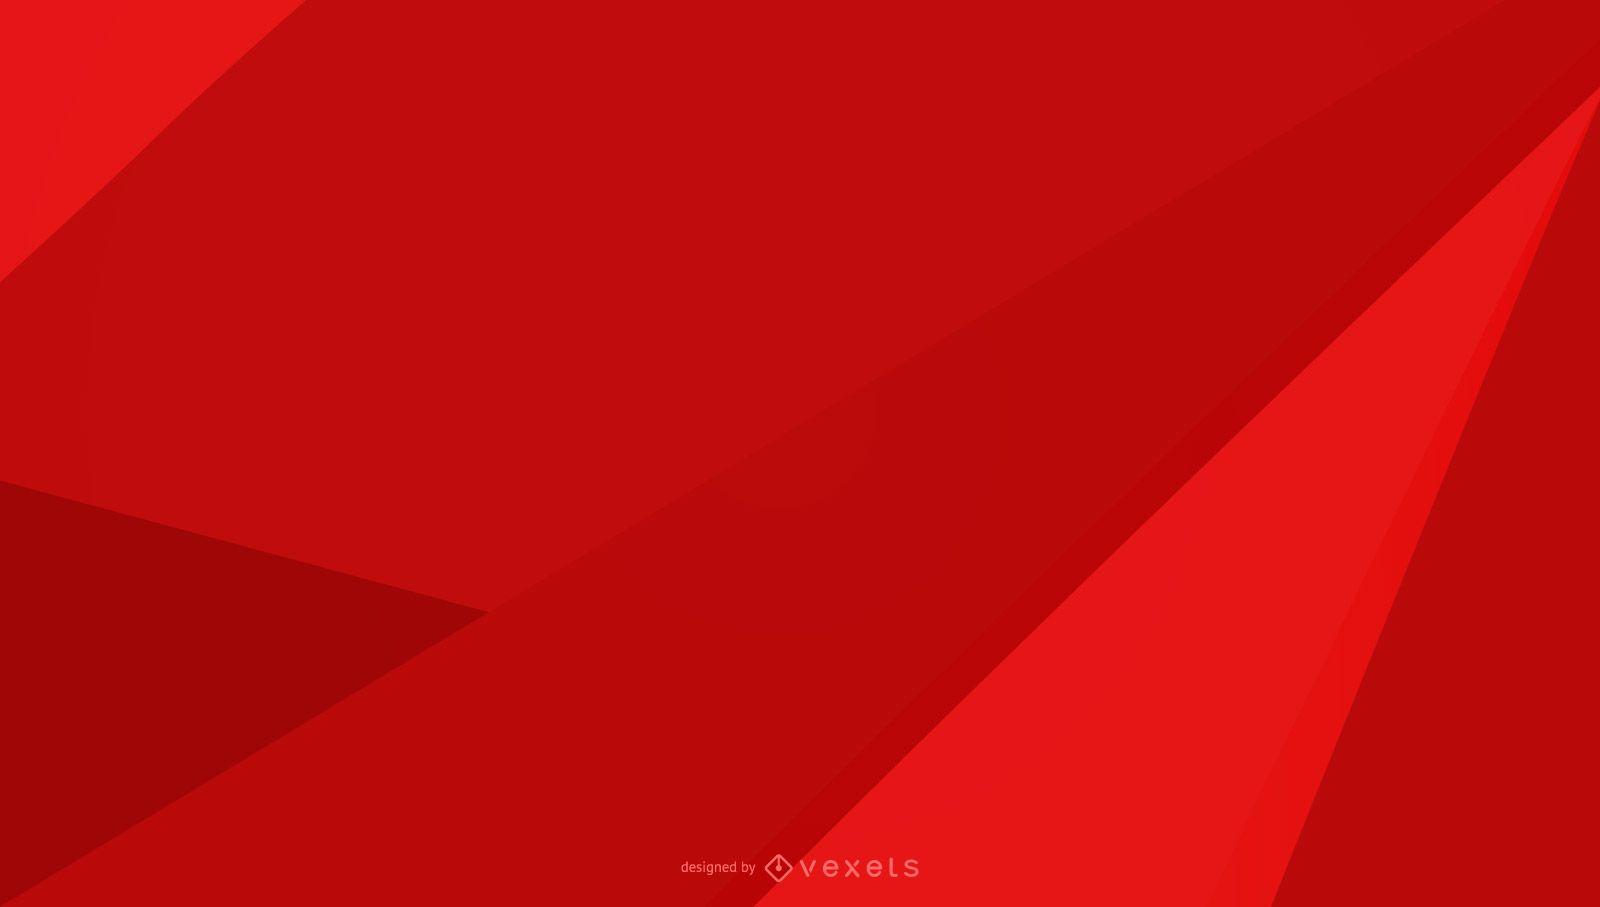 Diseño geométrico de fondo rojo